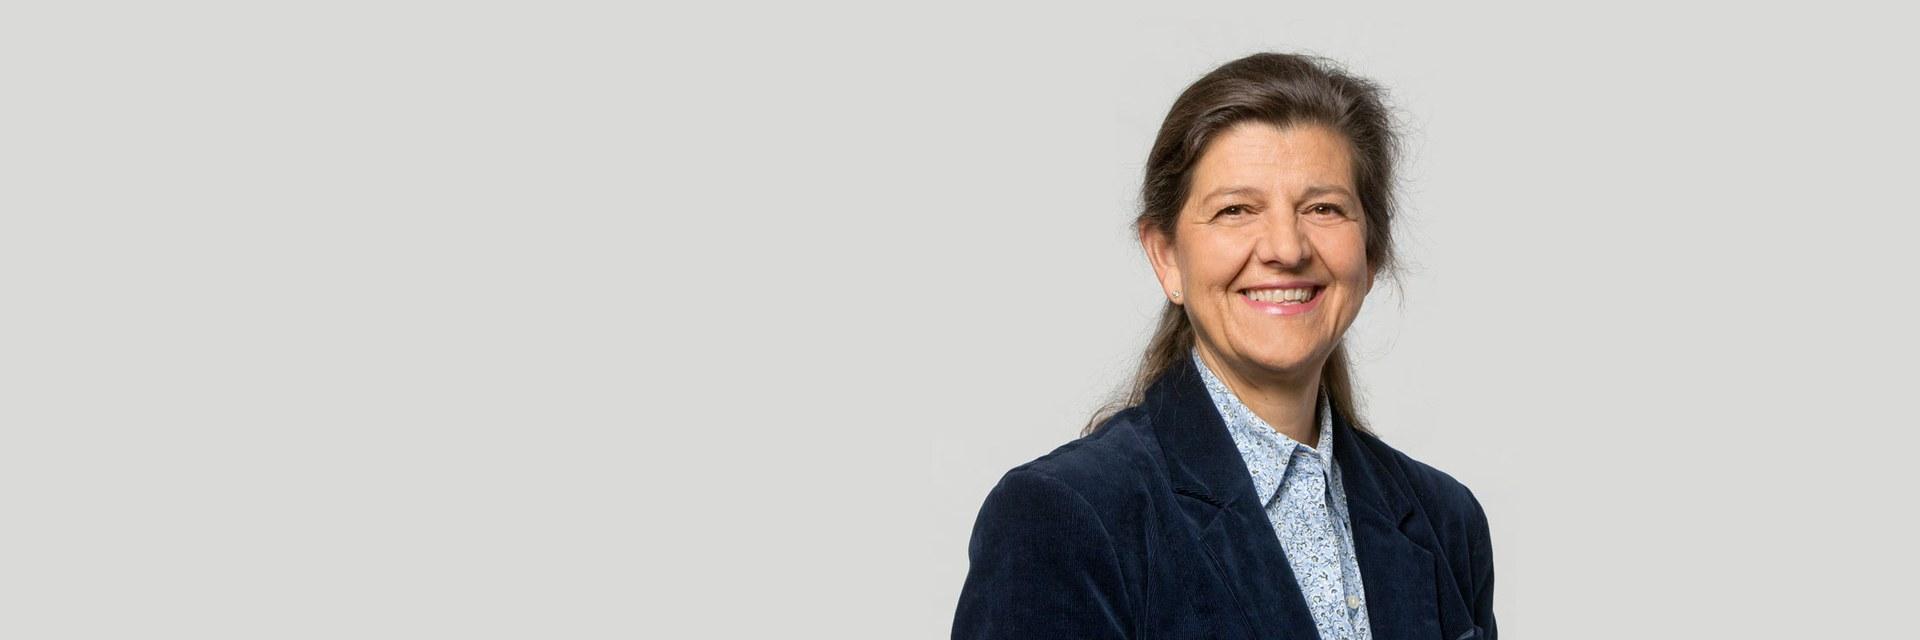 Paloma Baumann-Carmona